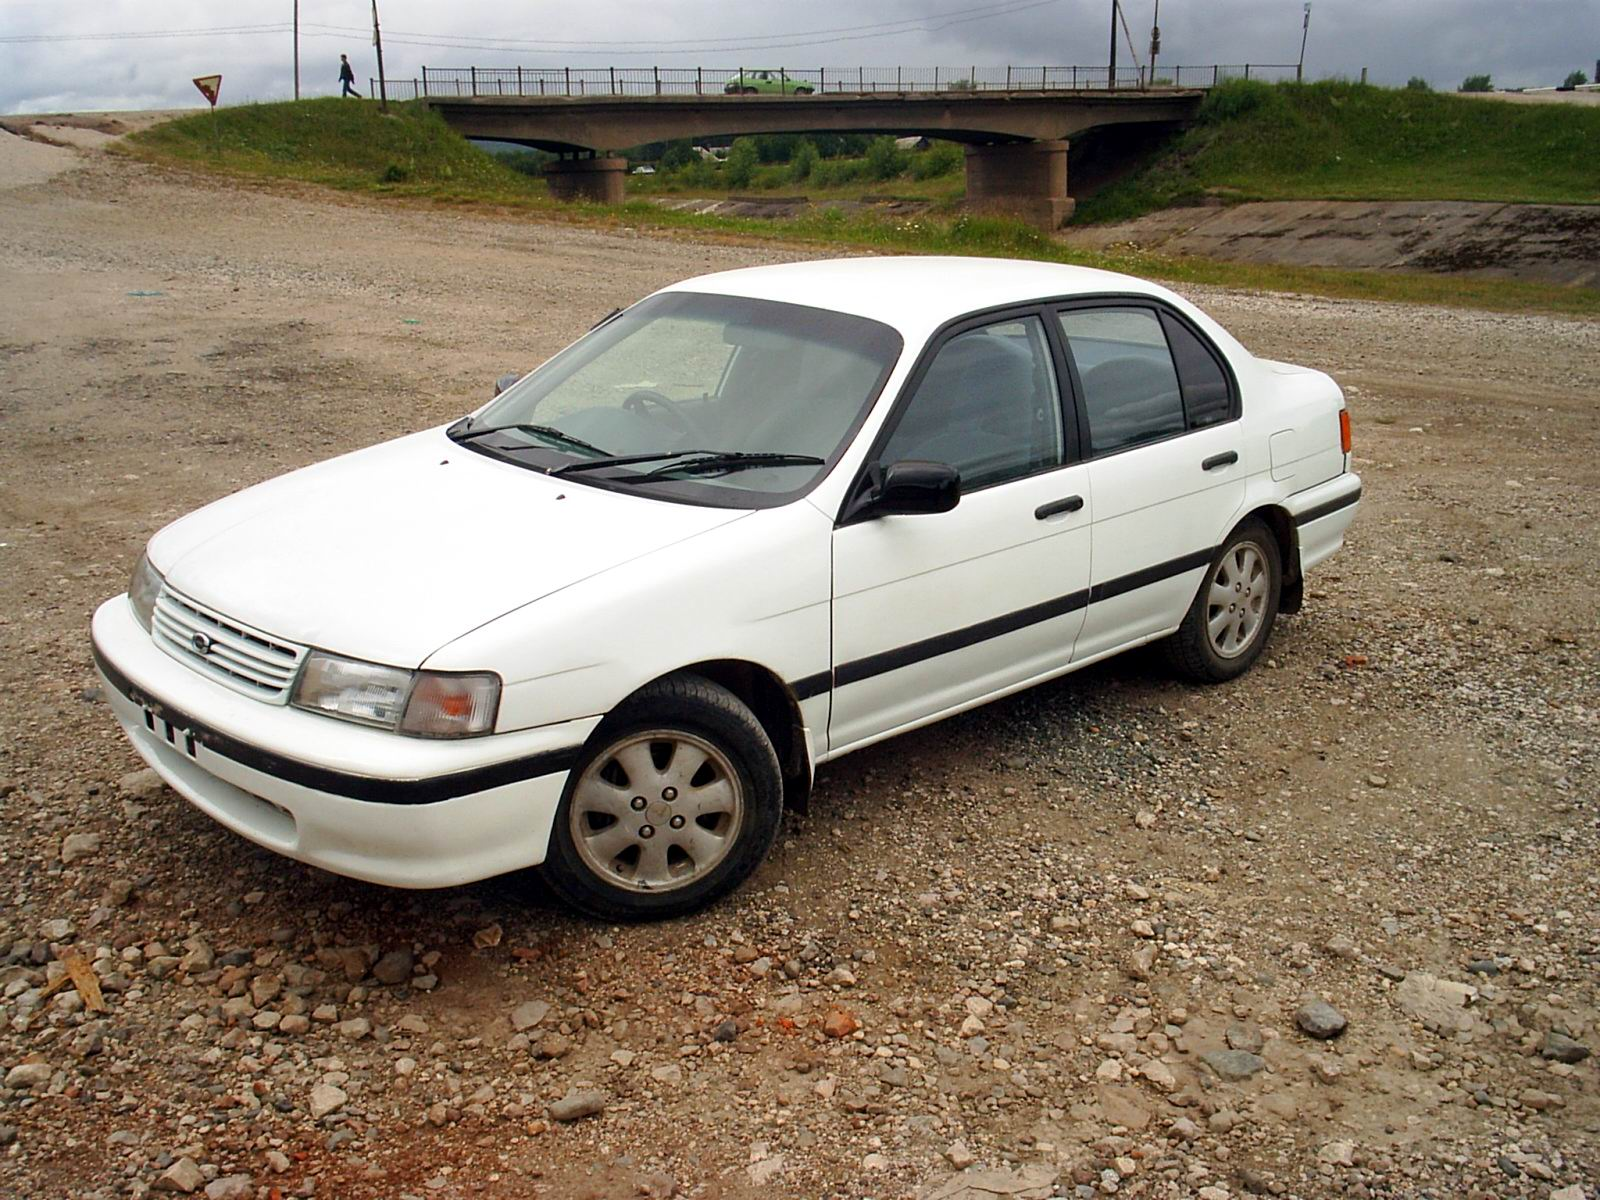 Toyota Corsa Orig on 1991 Toyota Tercel Problems